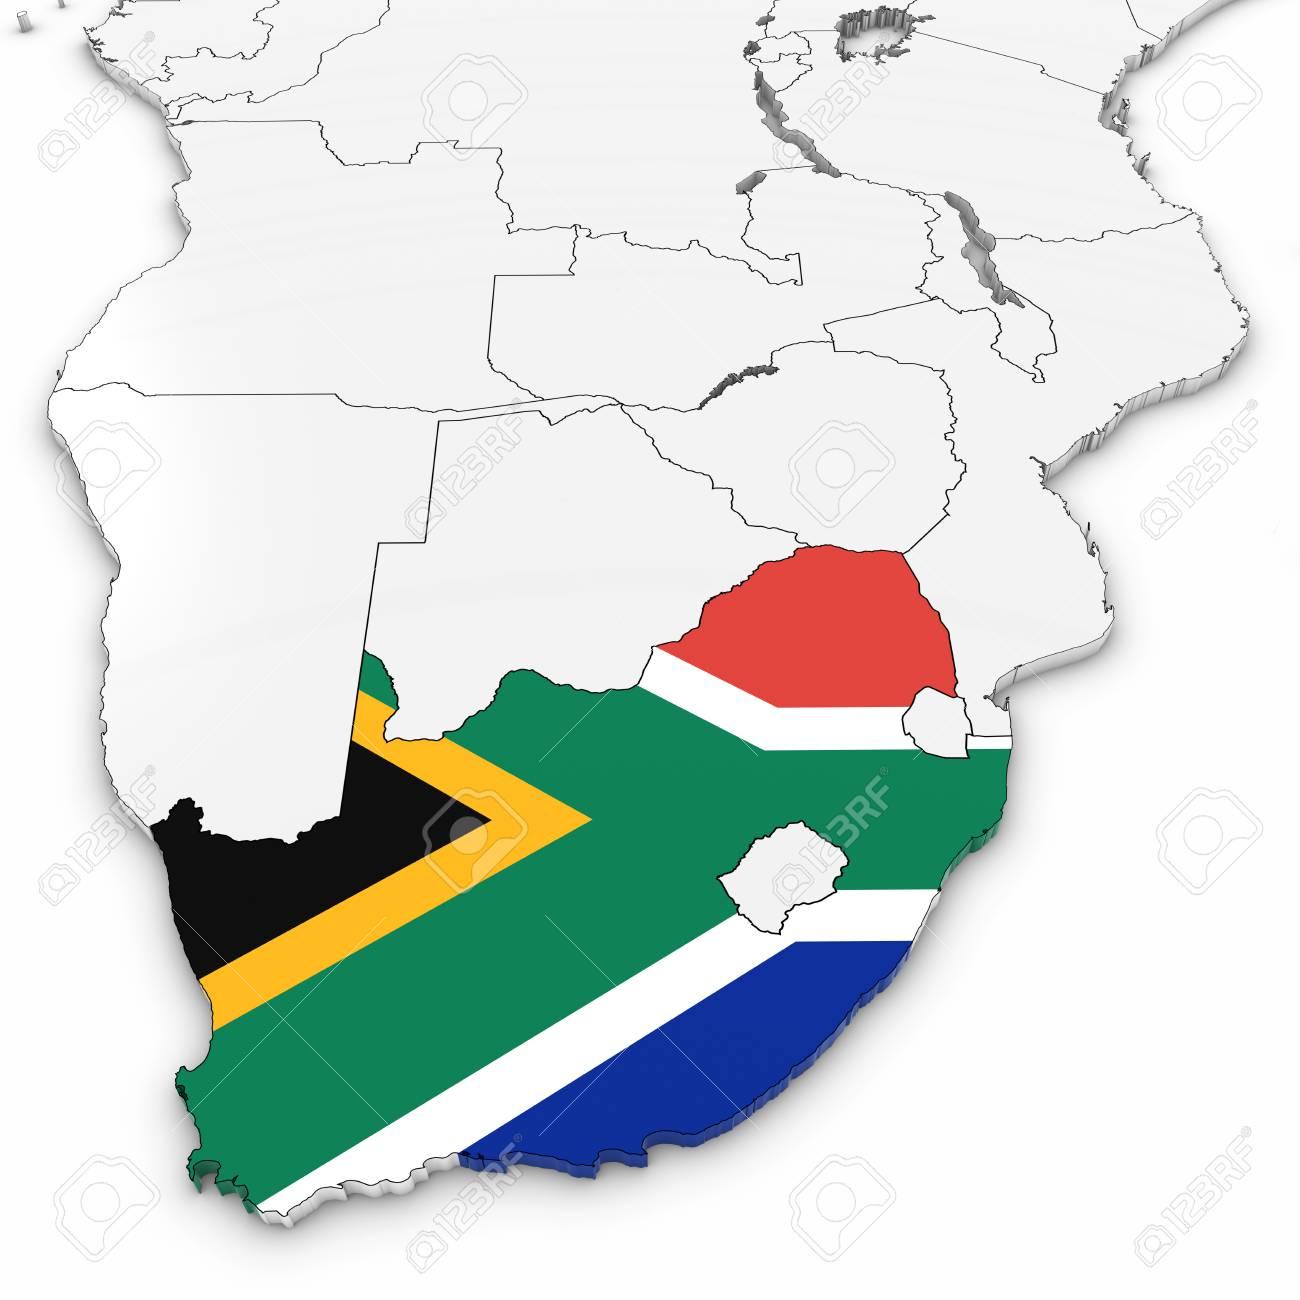 Südafrika Karte.Stock Photo